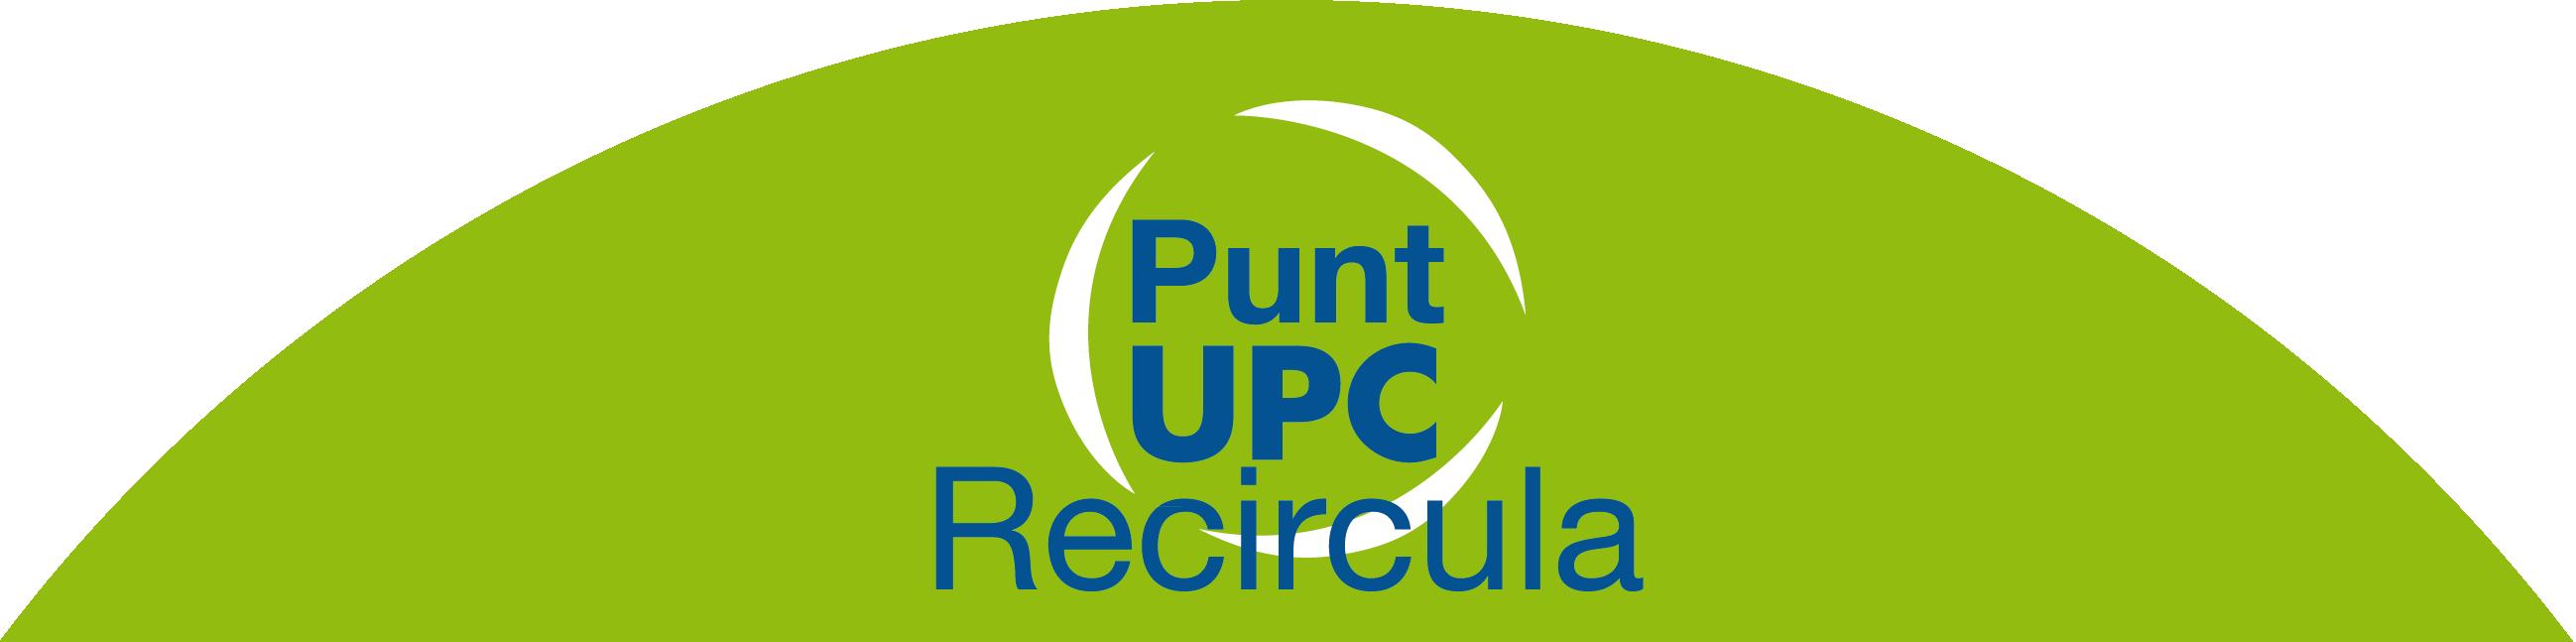 punt-upc-recircula_imatge_punt-verd.png